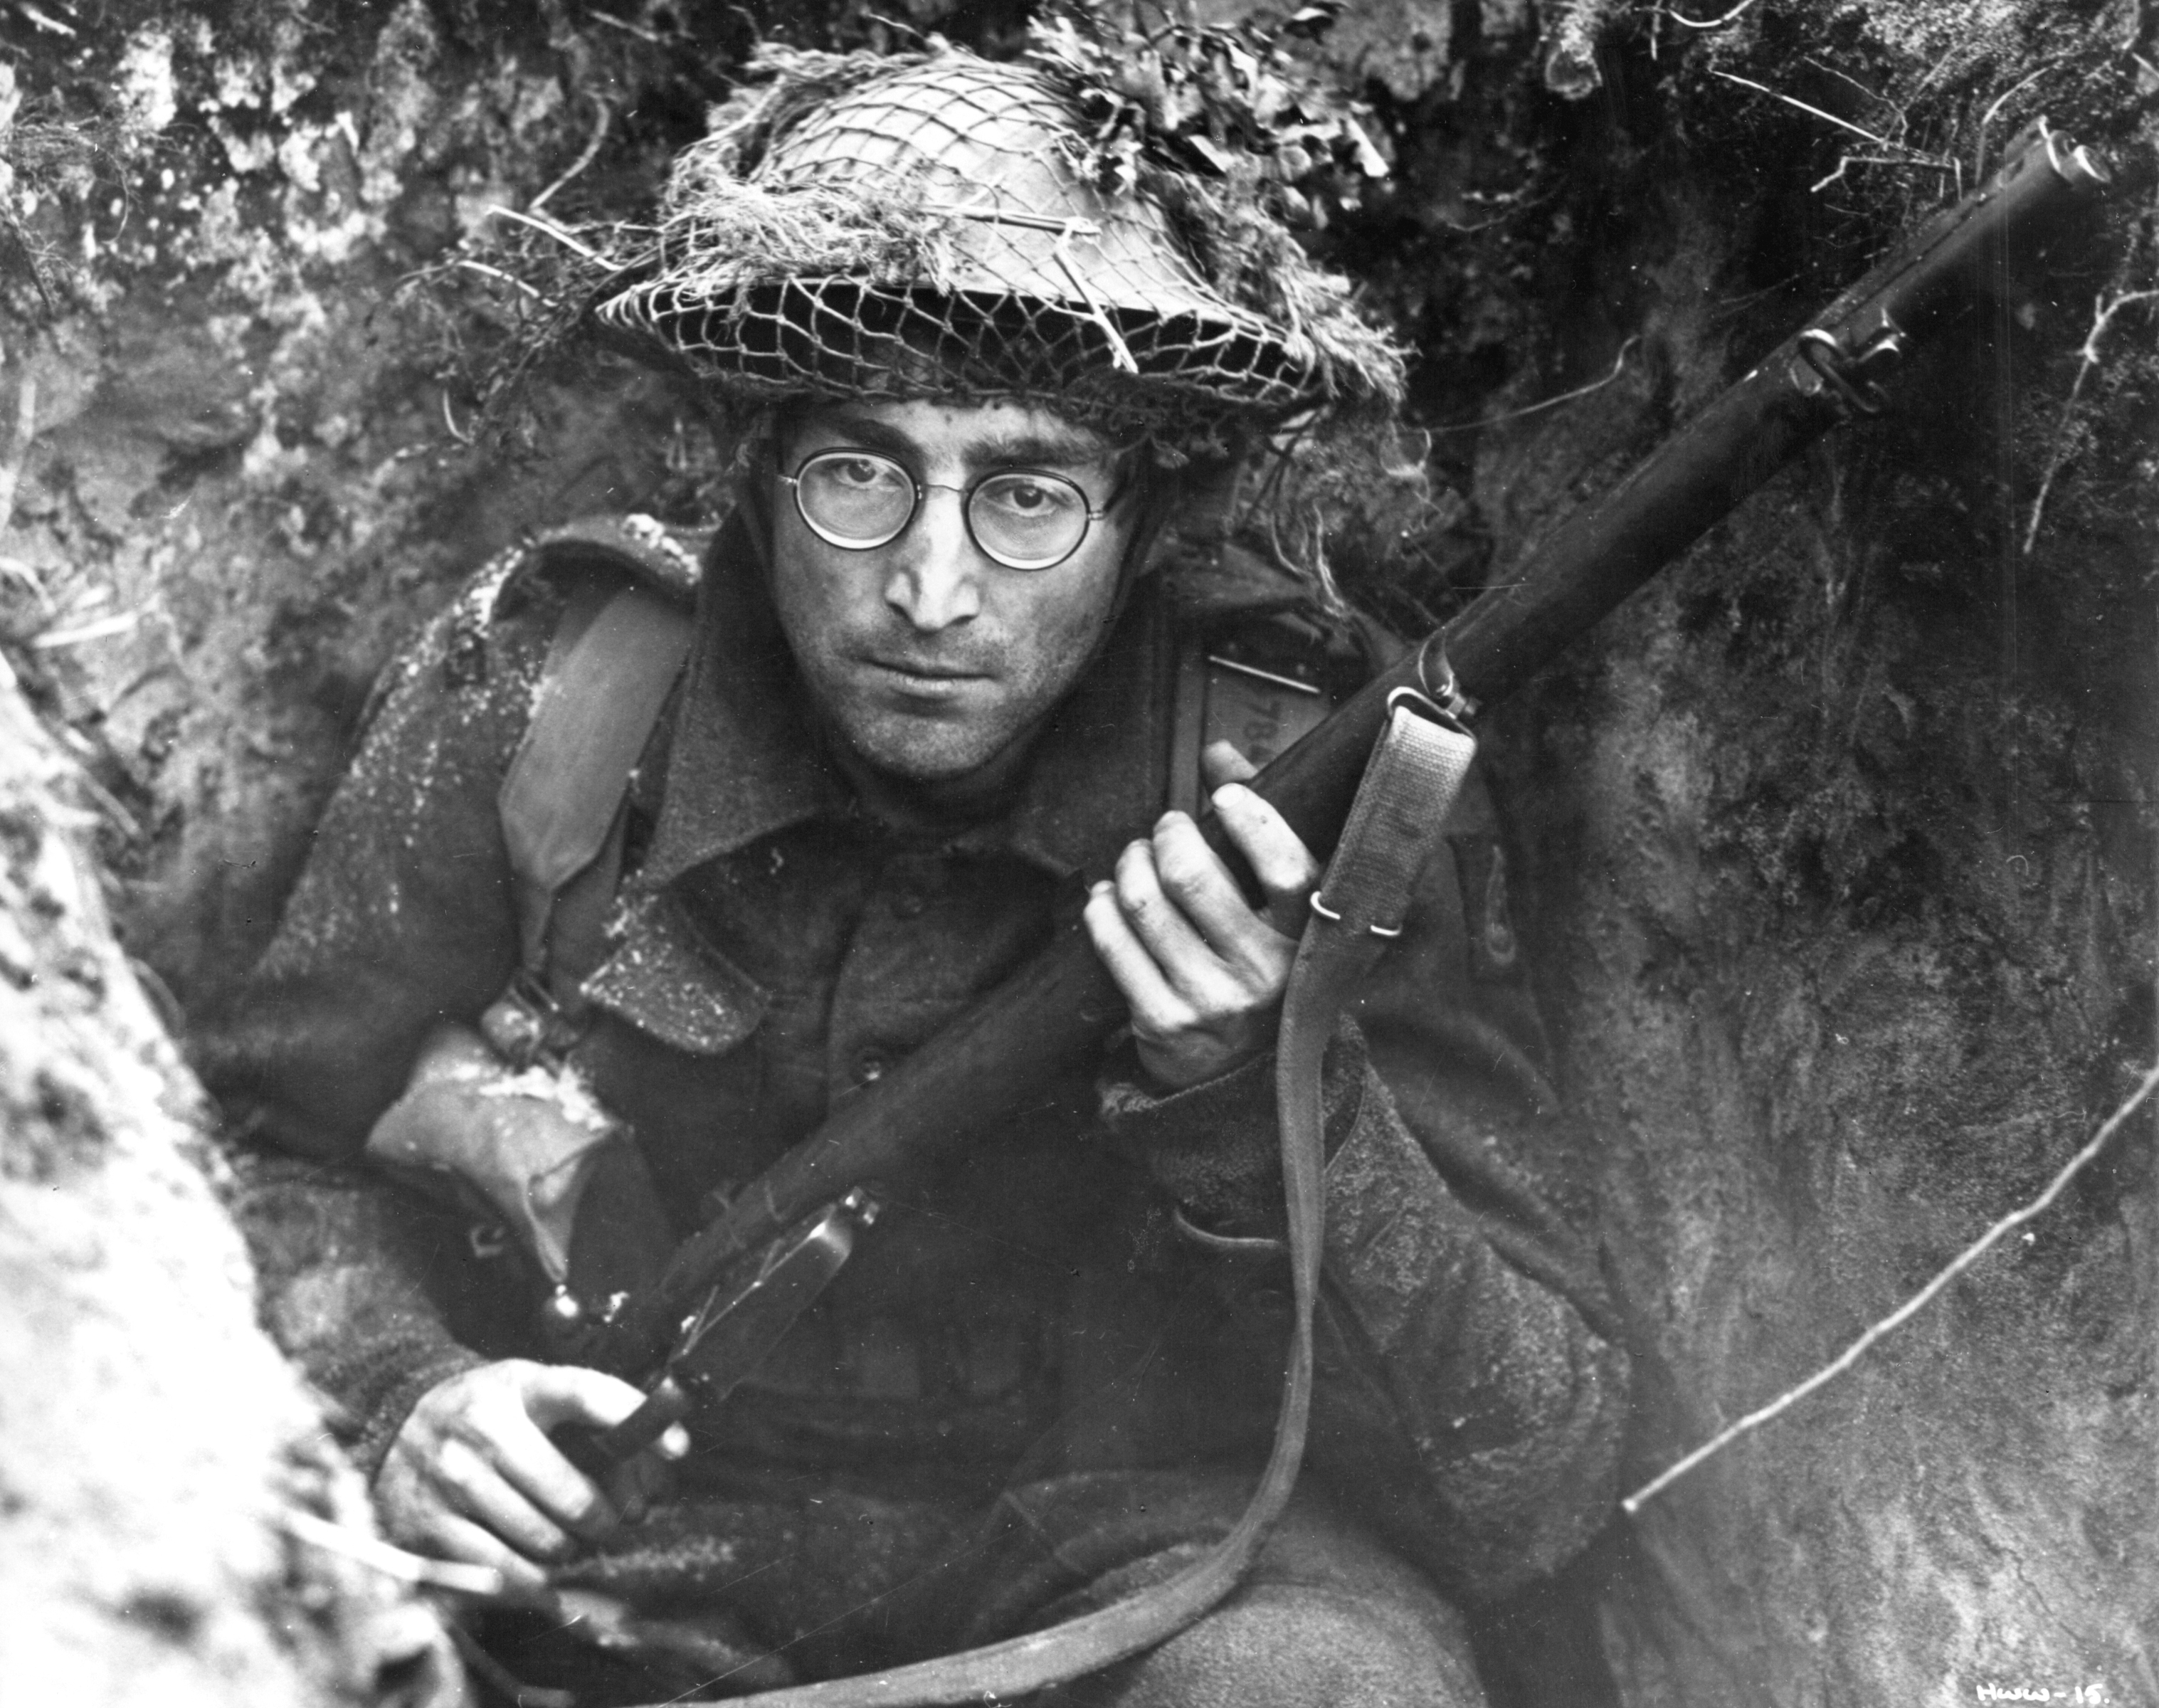 'Significant' Lock of John Lennon's Hair Hits Auction Block